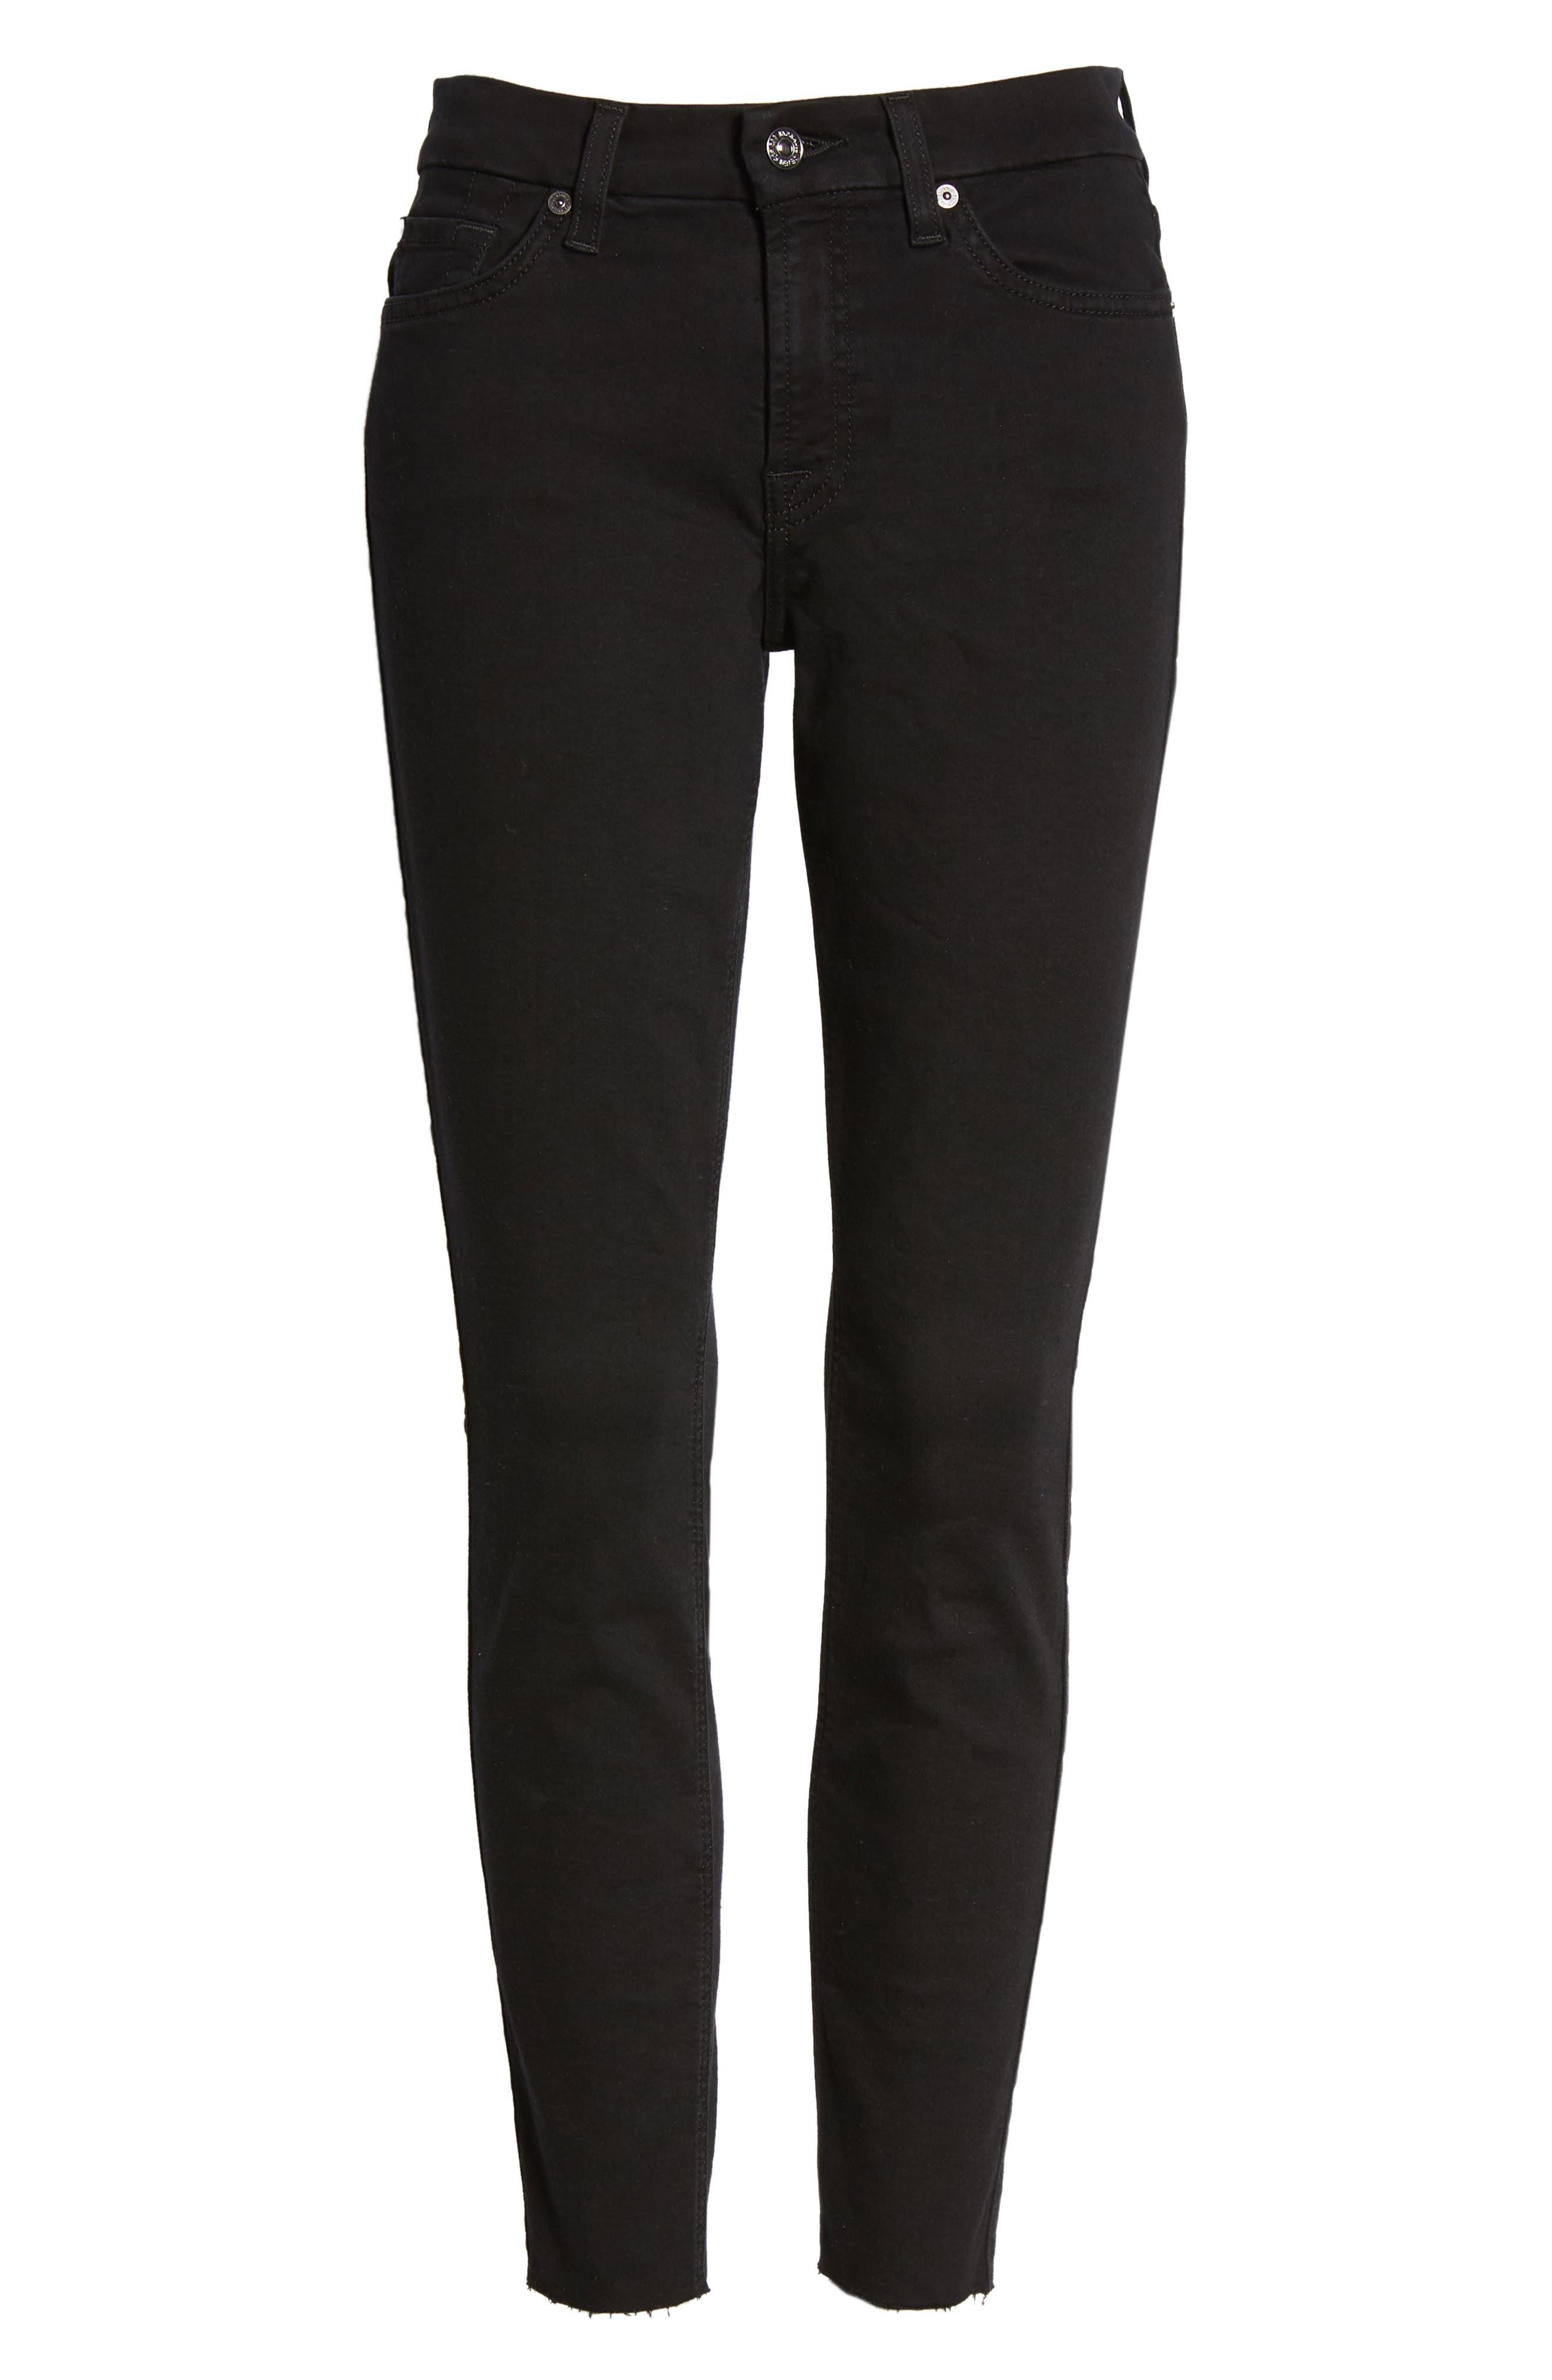 7 FOR ALL MANKIND<SUP>®</SUP>, b(air) Raw Hem Crop Skinny Jeans, Alternate thumbnail 7, color, BAIR BLACK